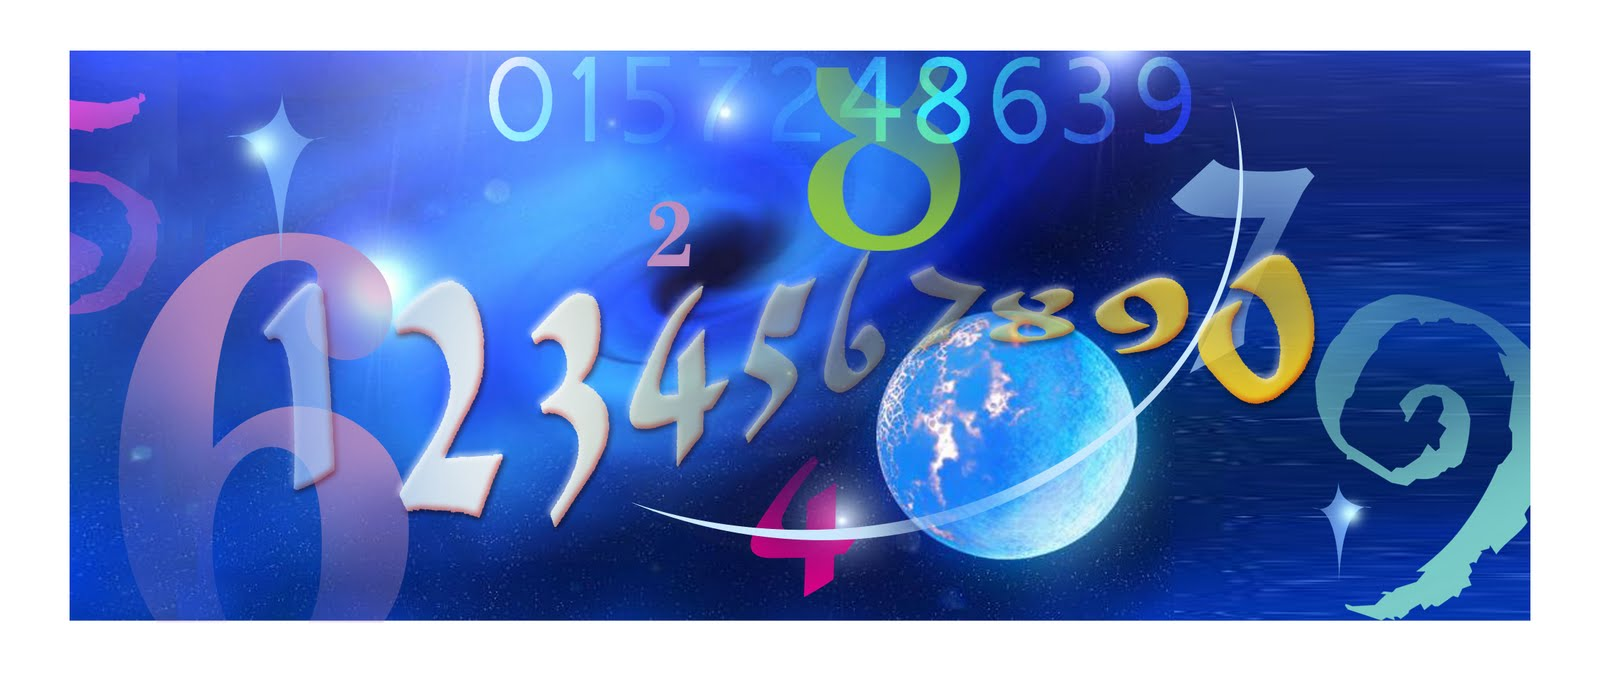 Brojevi i šifre za bolji život Grigorija Grabovoja